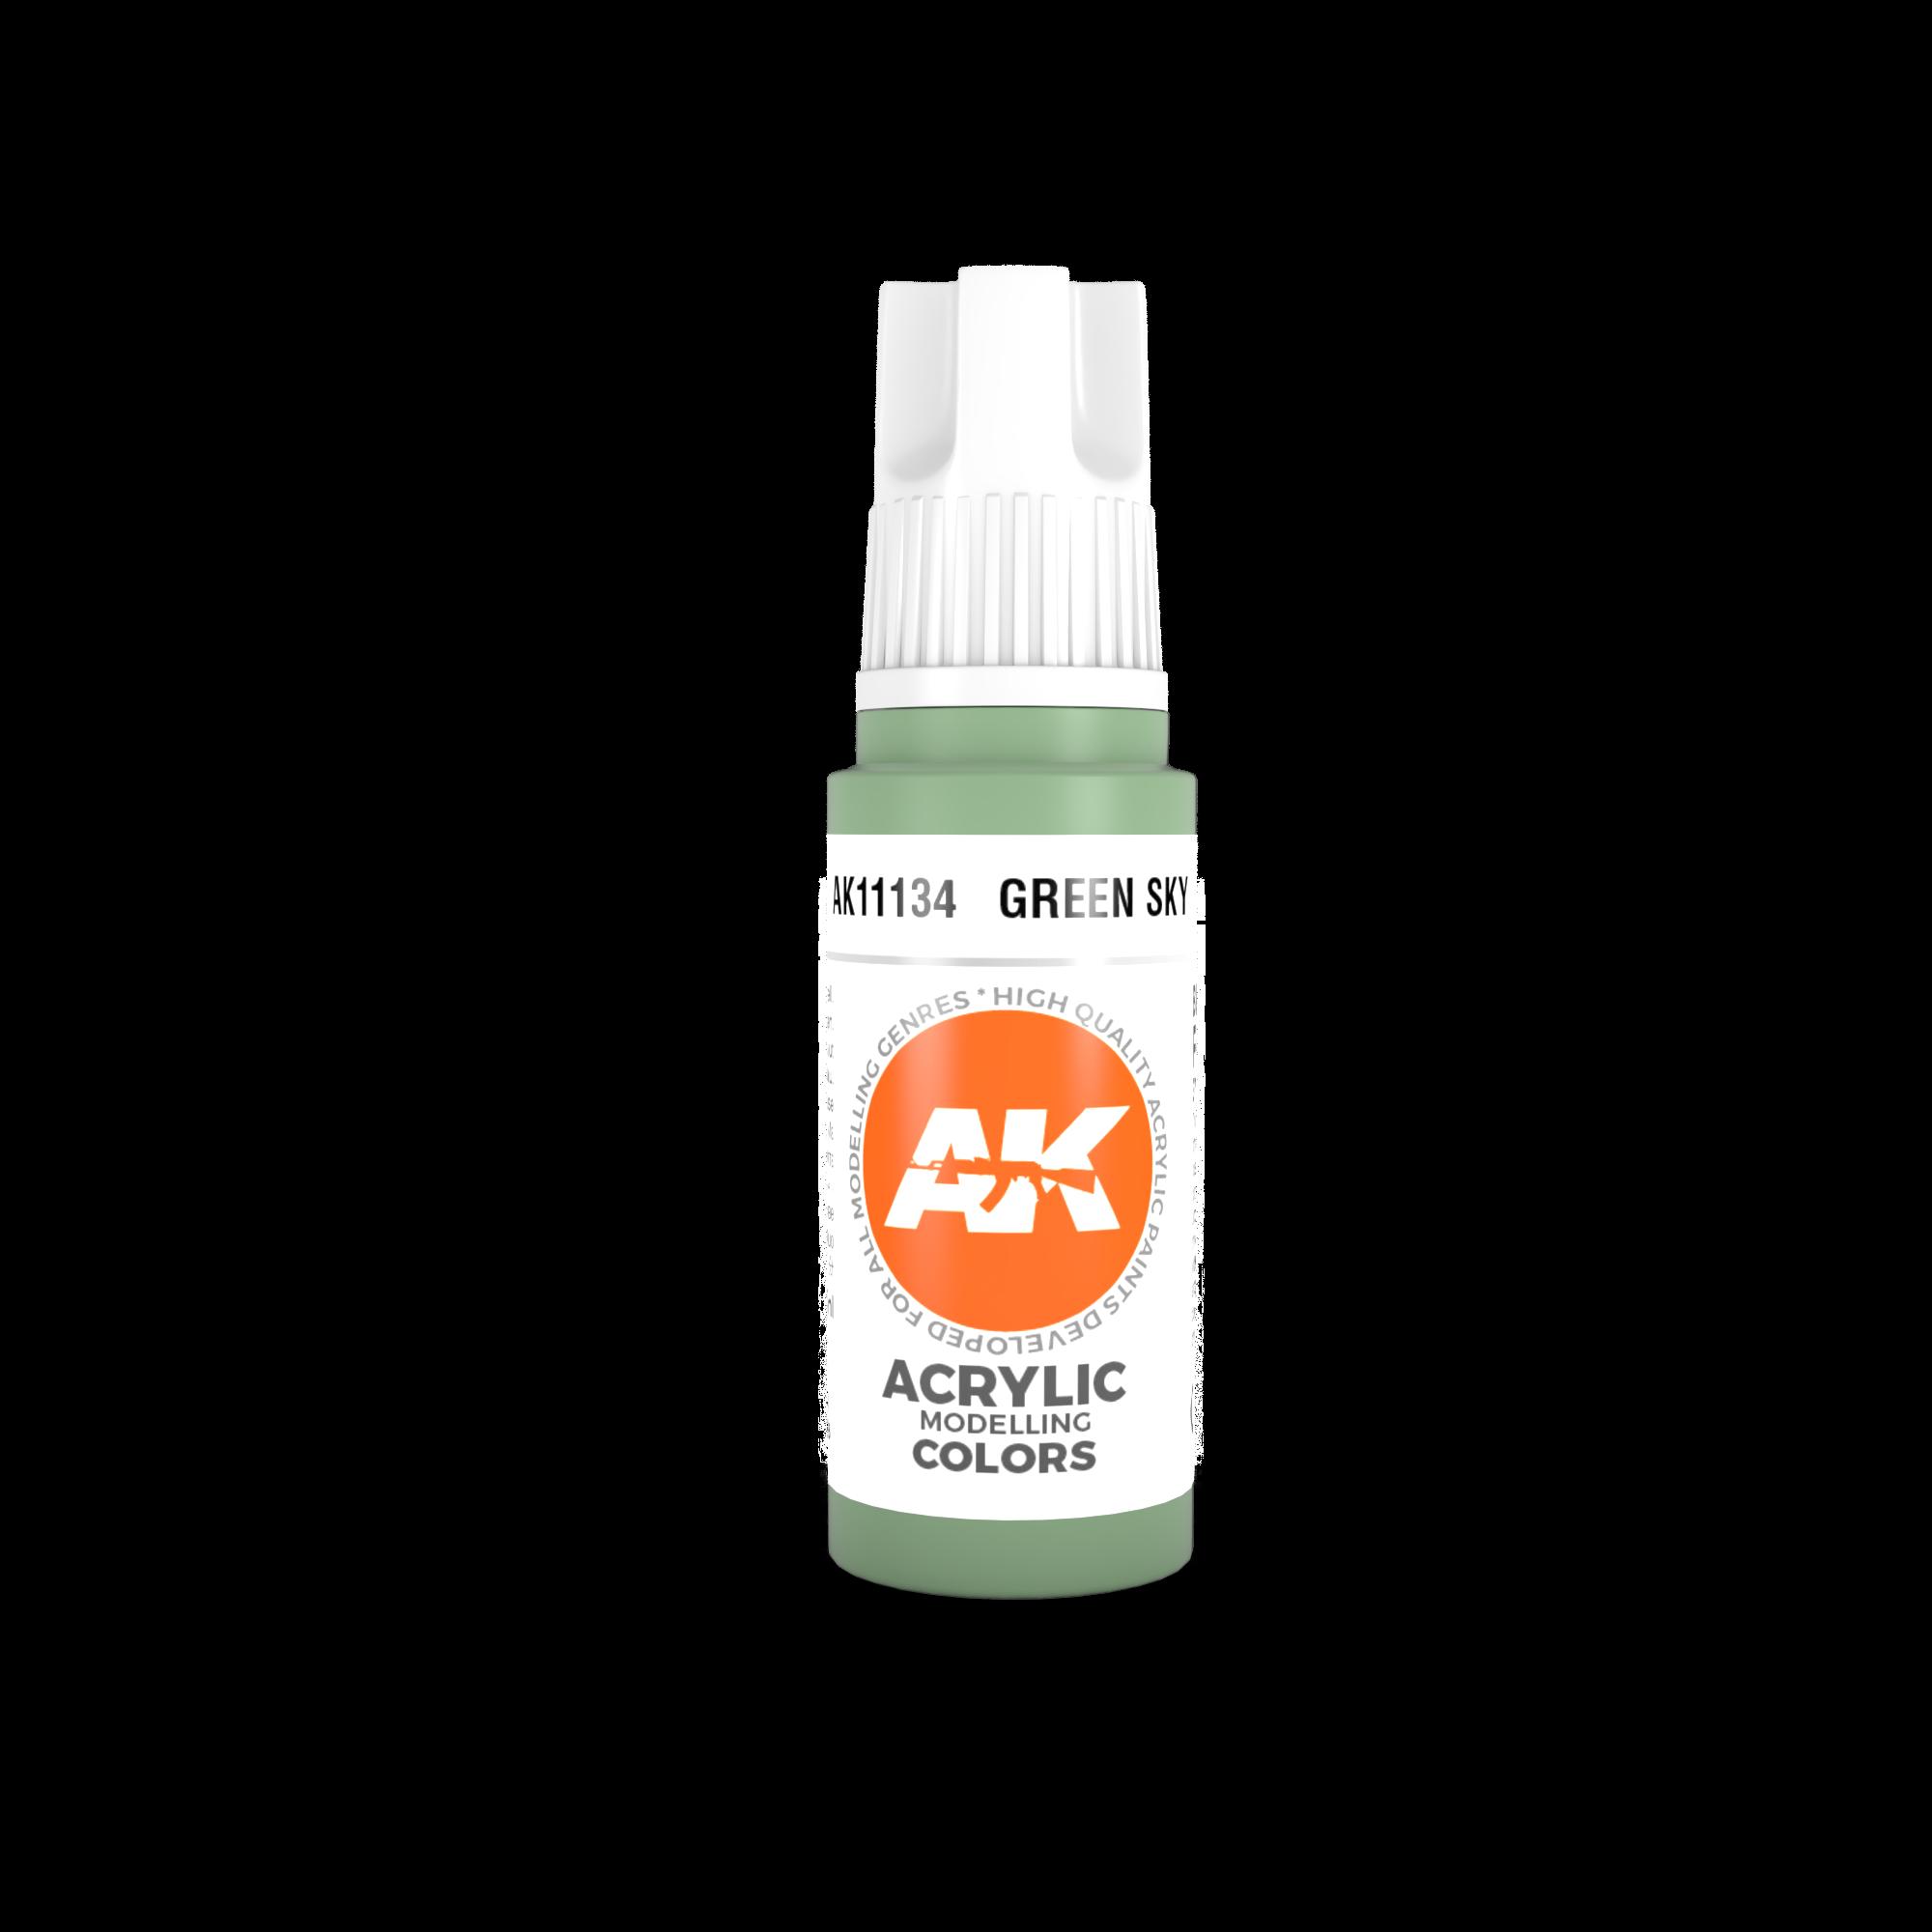 AK-Interactive Green Sky Acrylic Modelling Color - 17ml - AK-11134